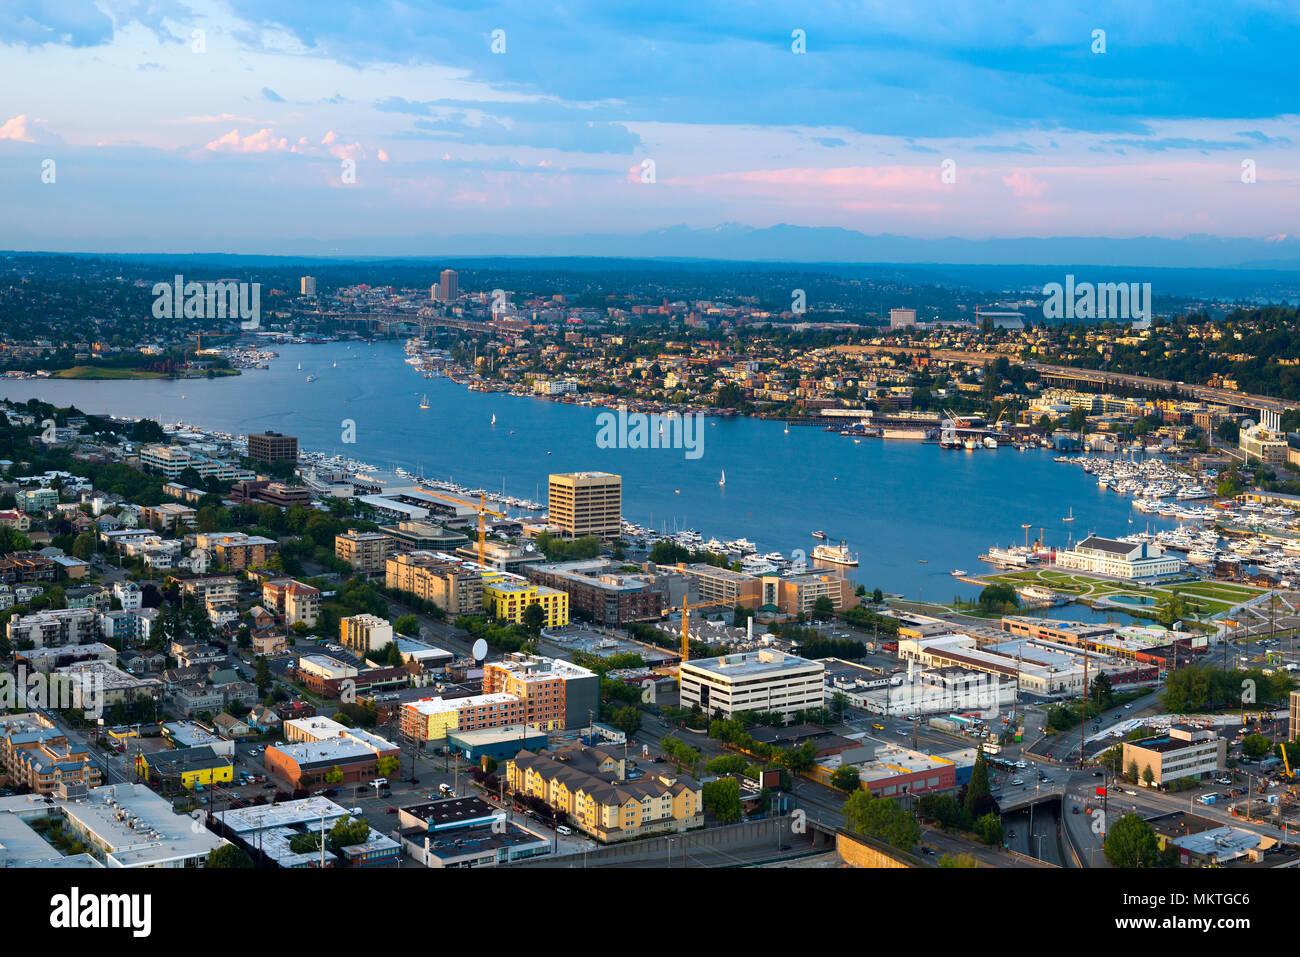 Lake Union and Cascade district, Seattle, Washington State, USA Stock Photo